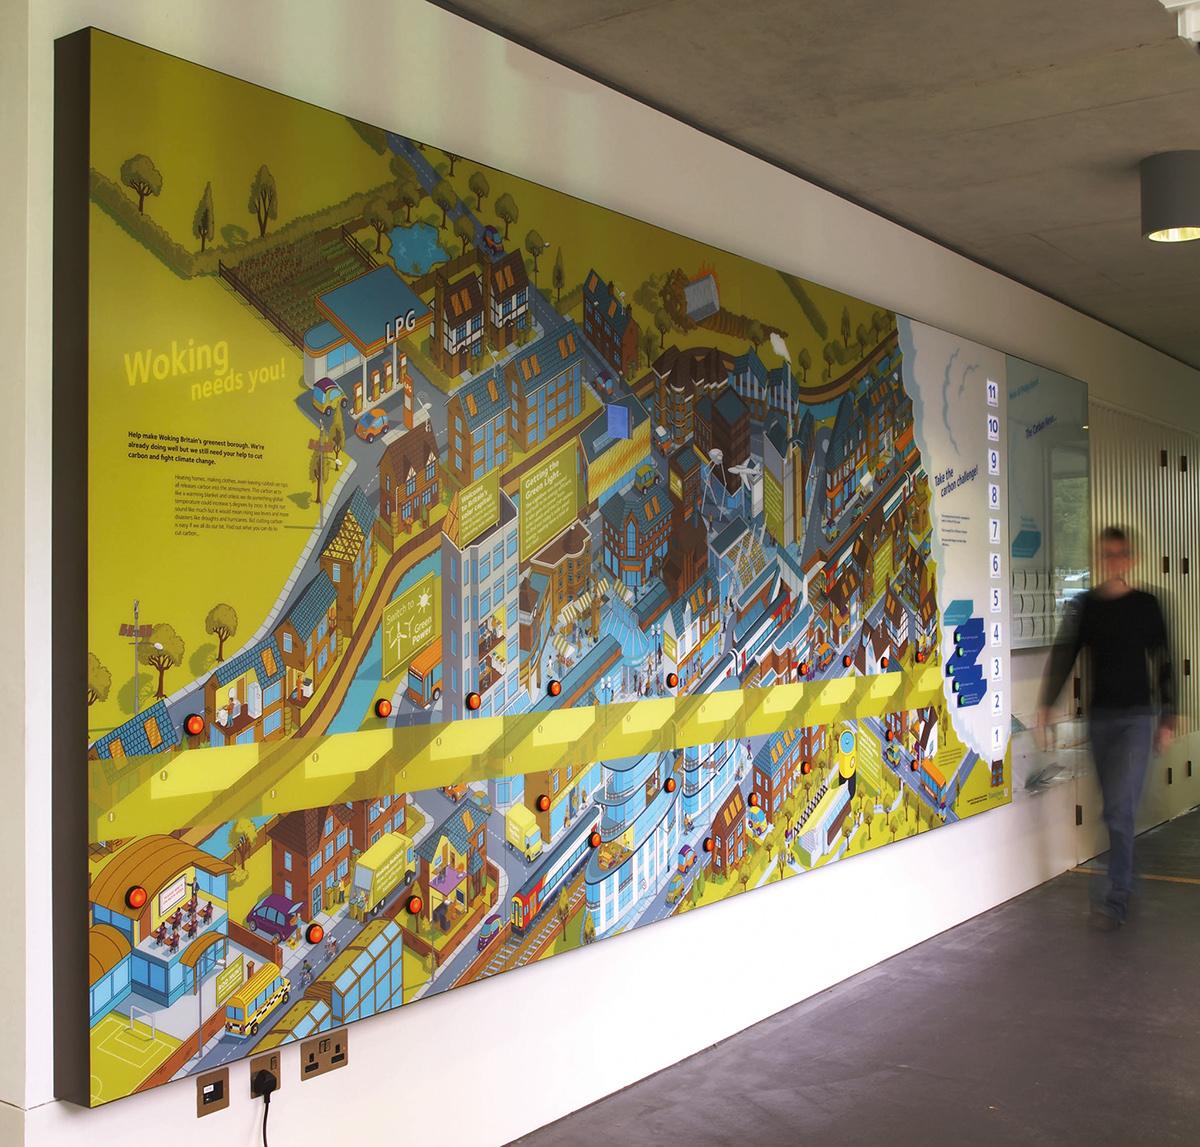 Lightbox interactive environmental graphic display on behance for Environmental graphics giant world map wall mural